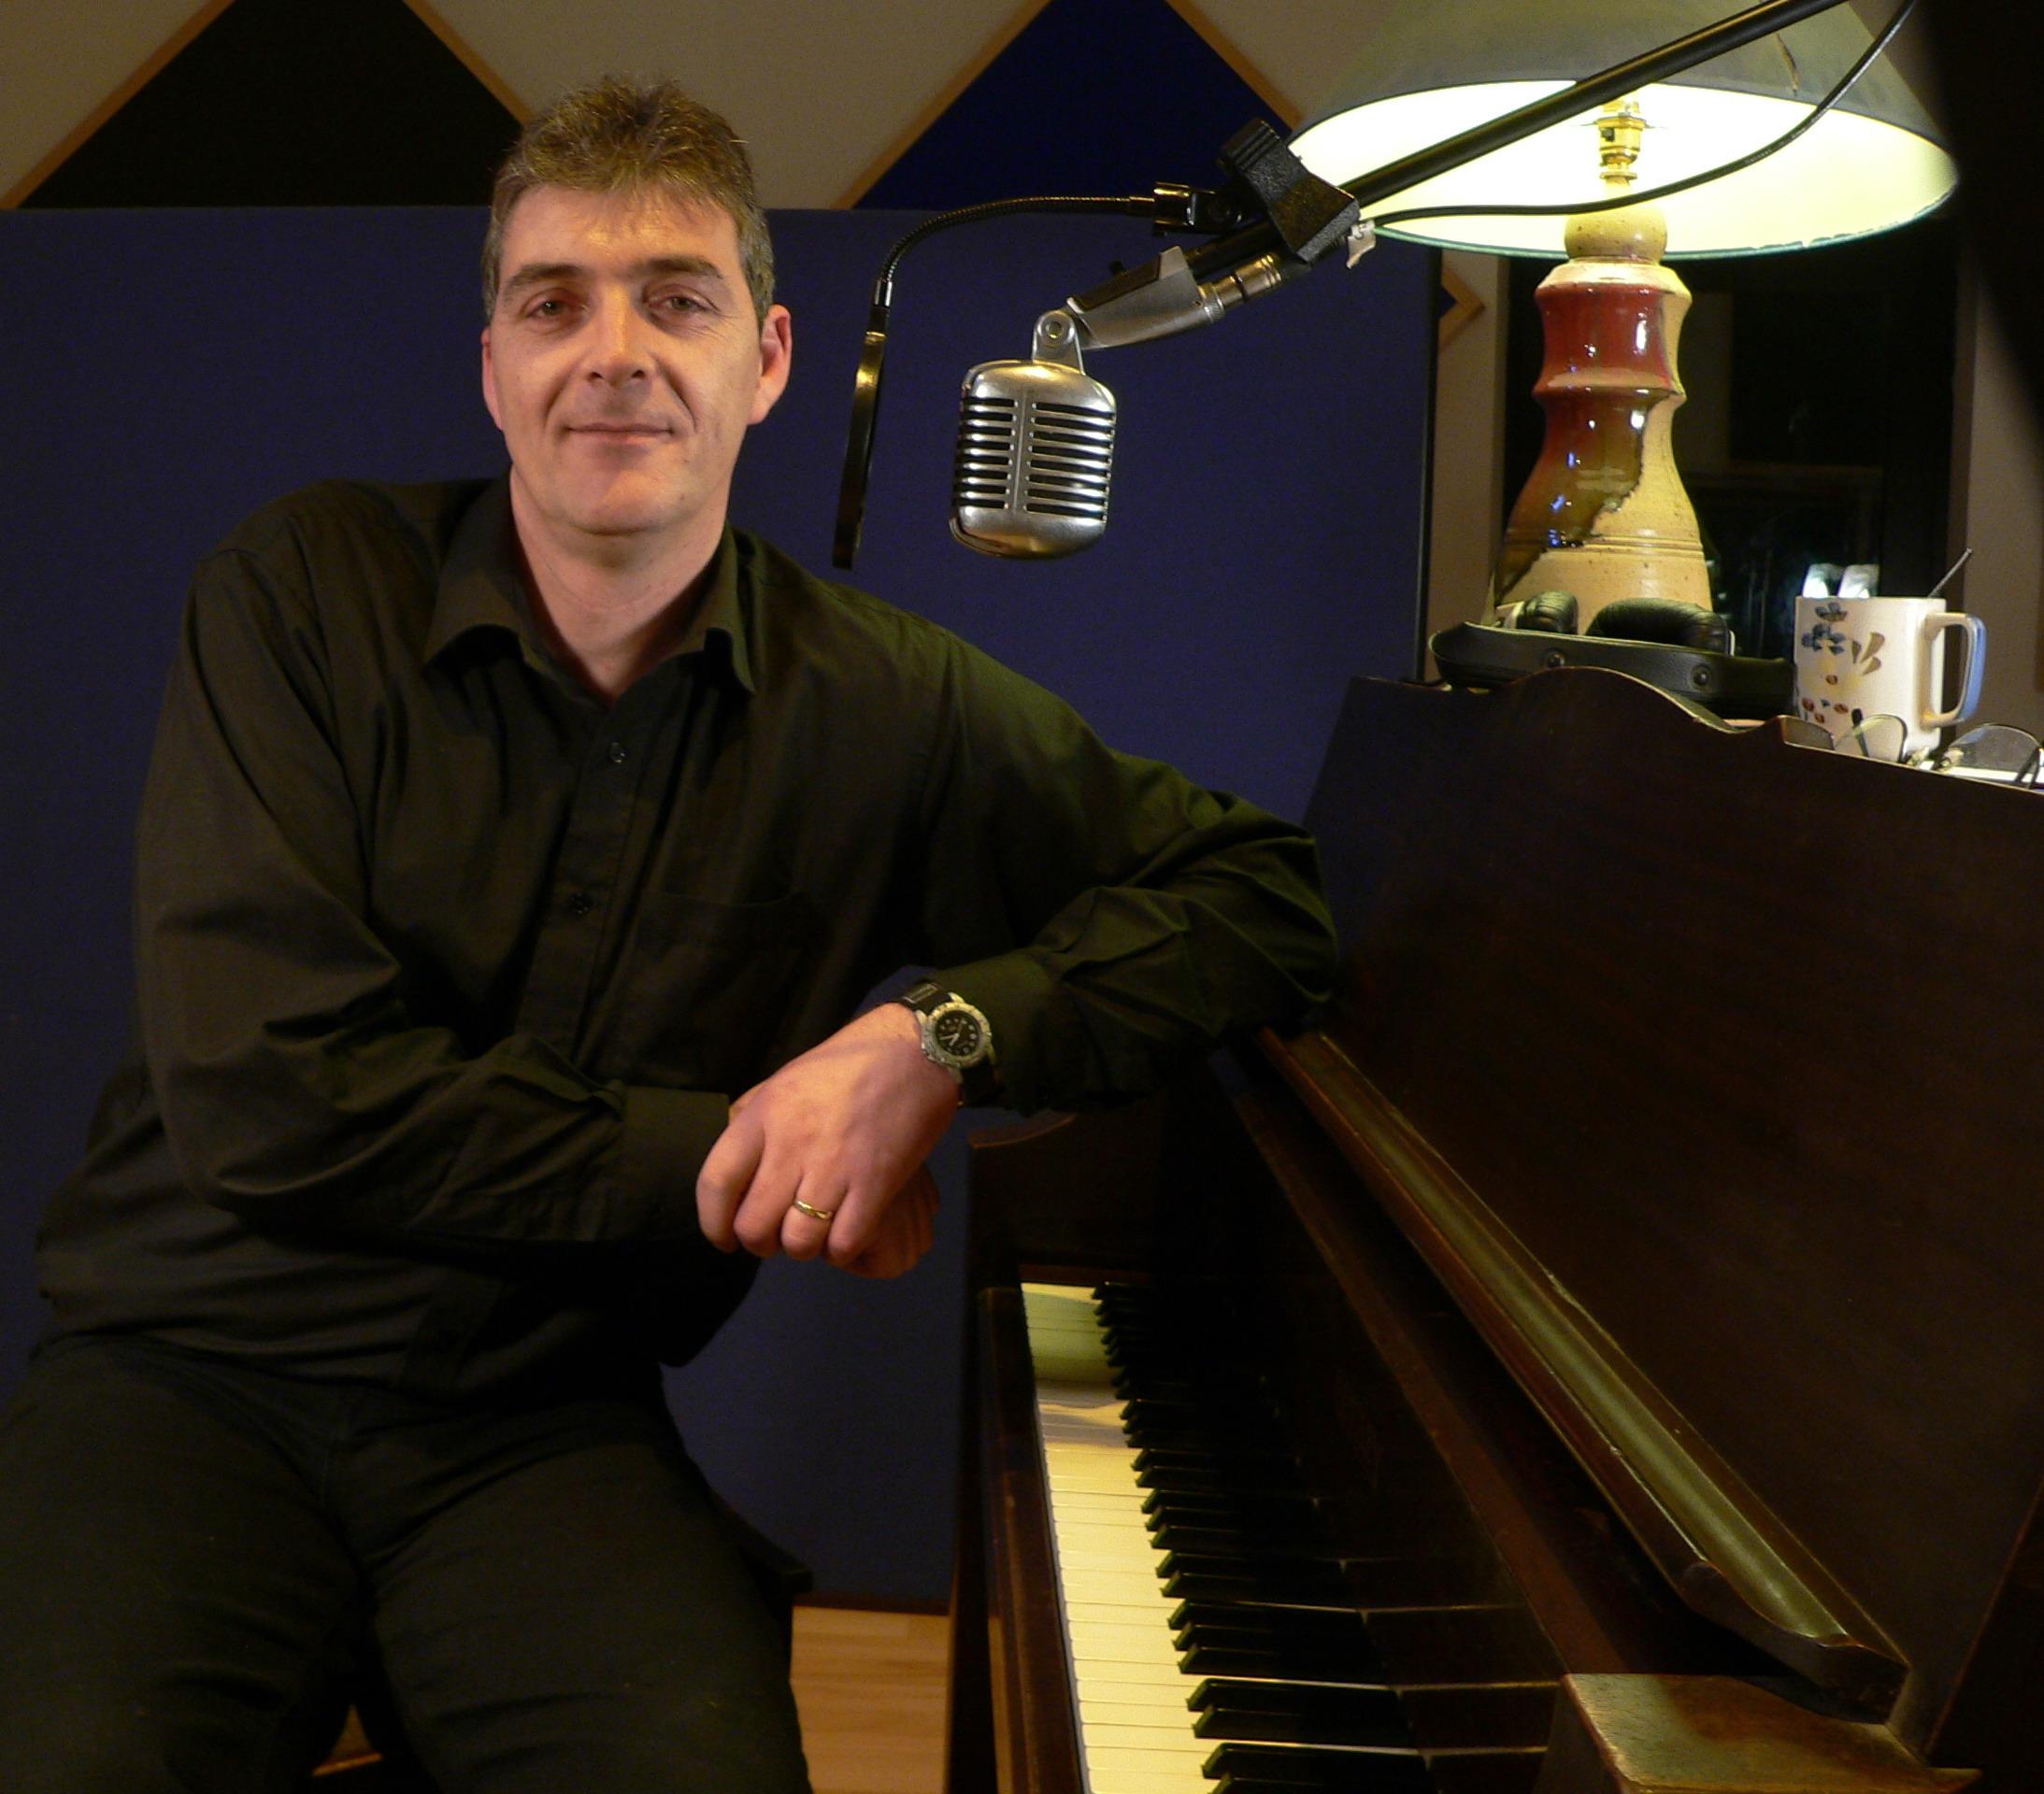 Mick Flavin records Lifetime Guarantee